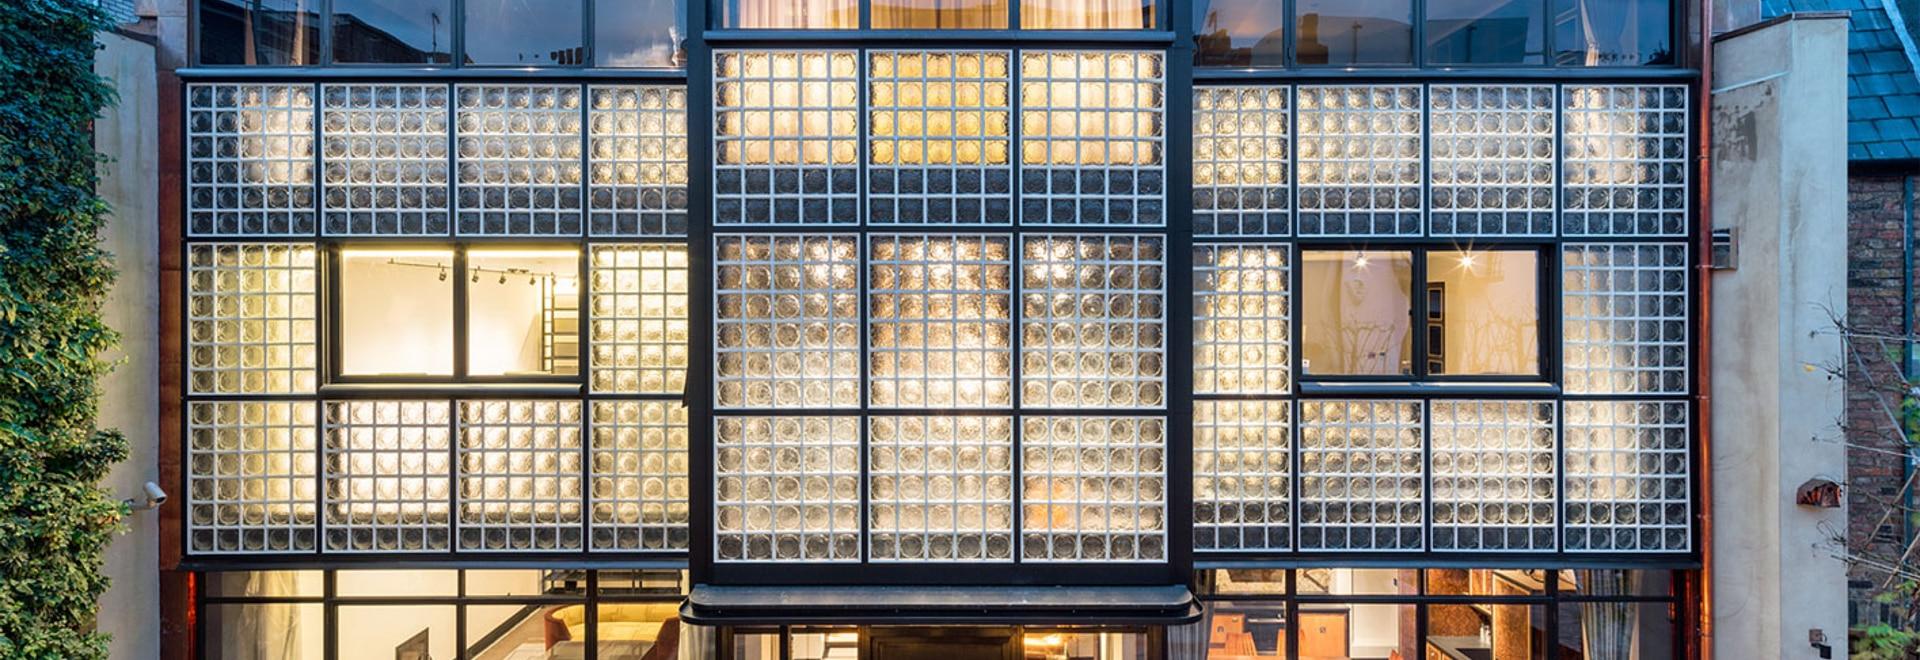 home homage: london's eglon house is inspiredthe maison de verre